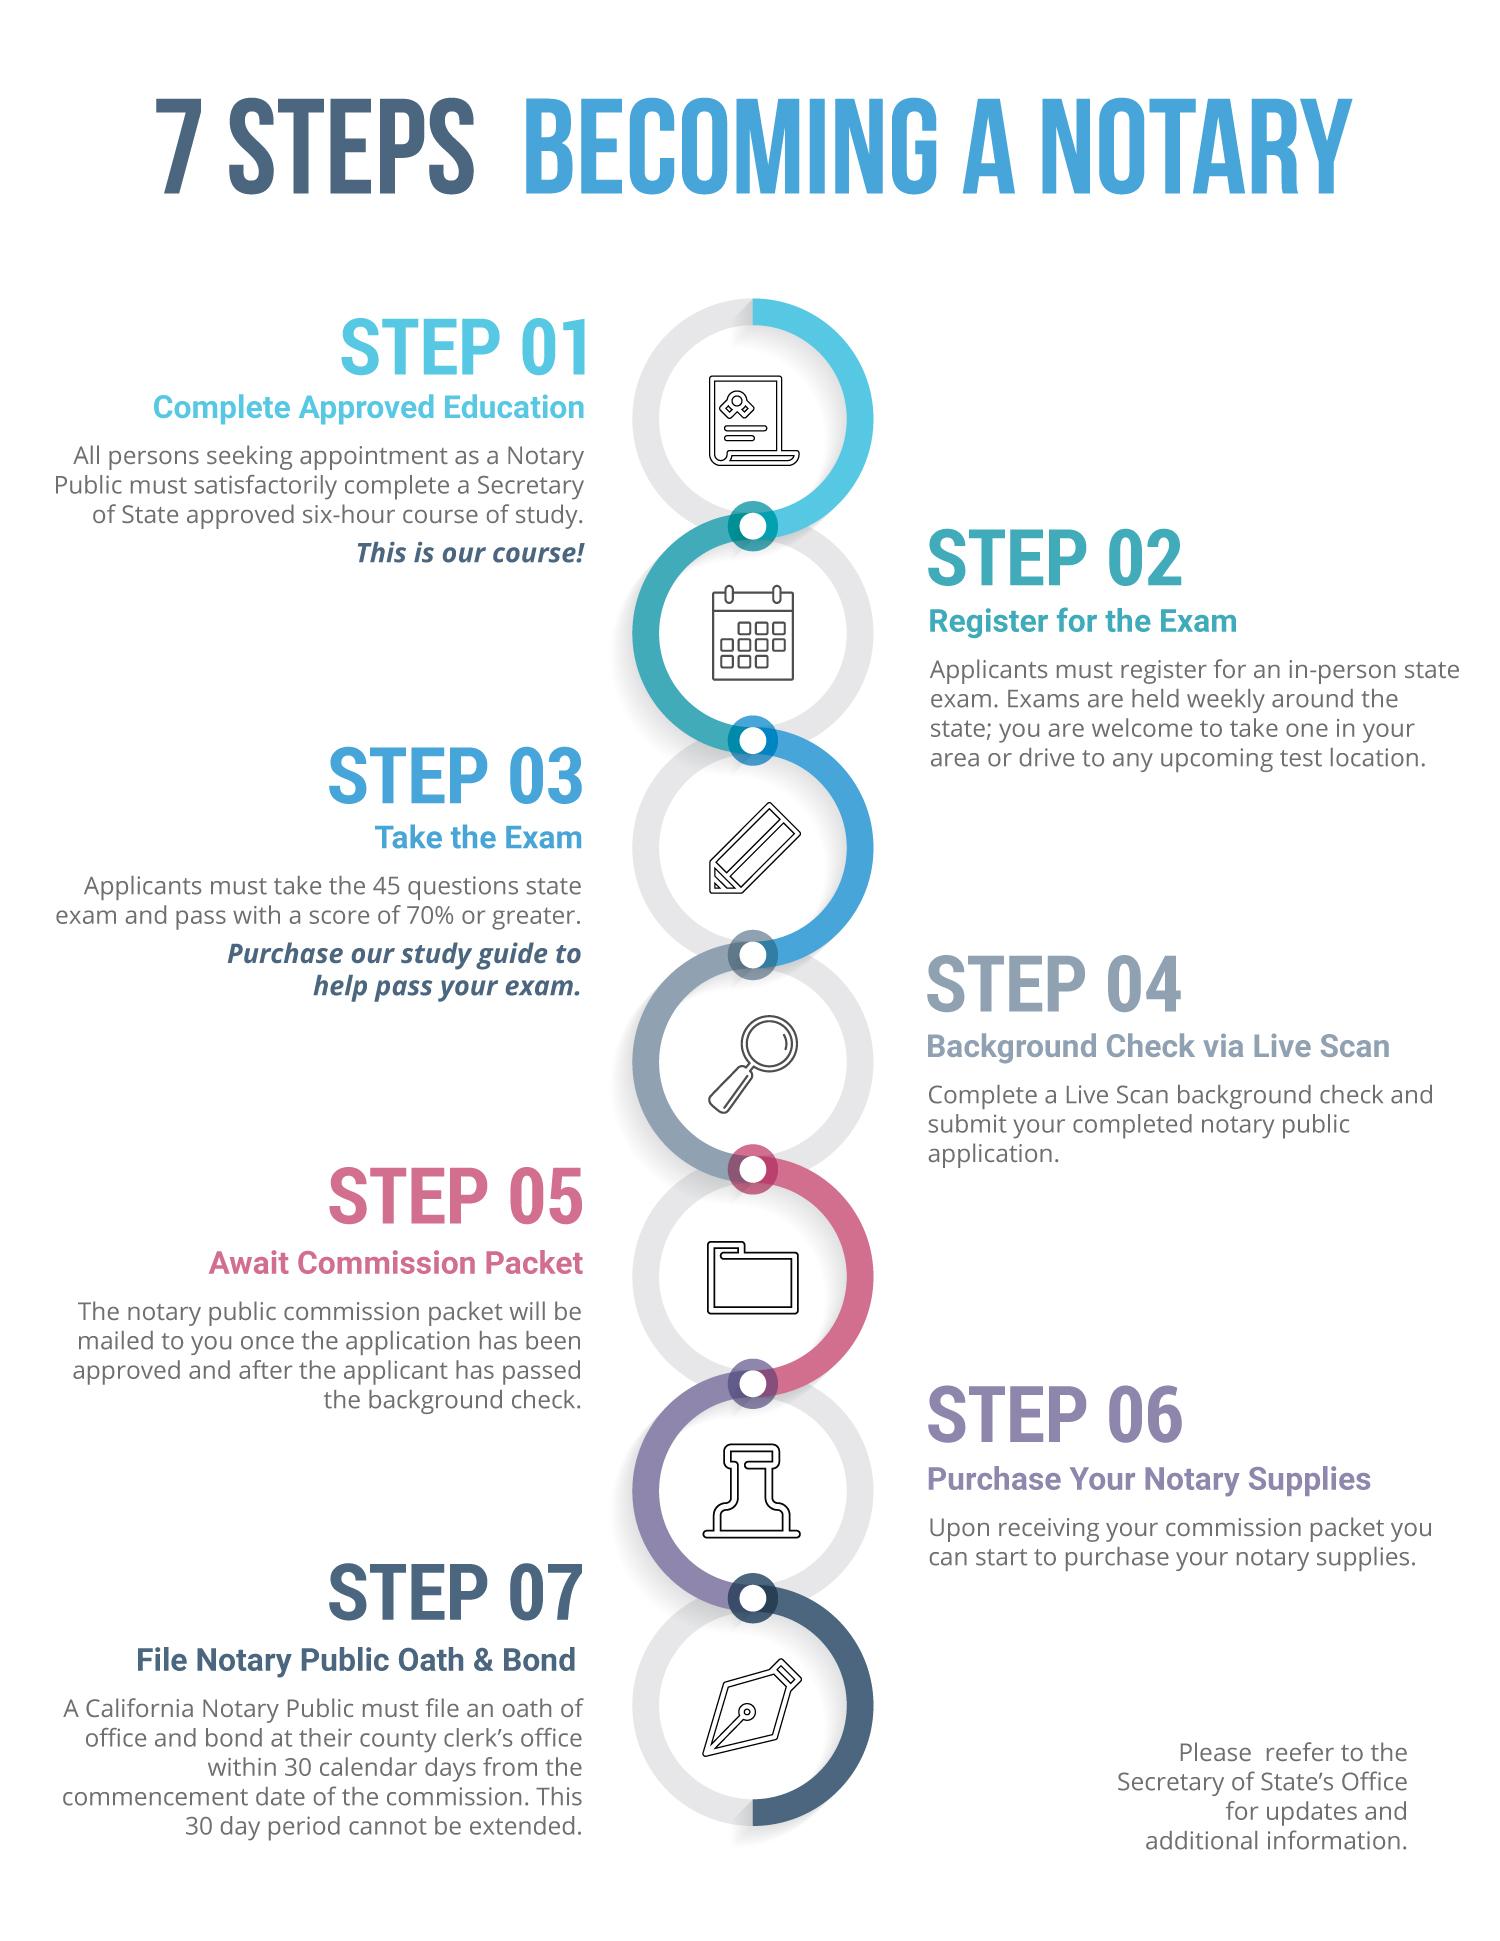 7-steps-california-notary-2 - Notary Council of California